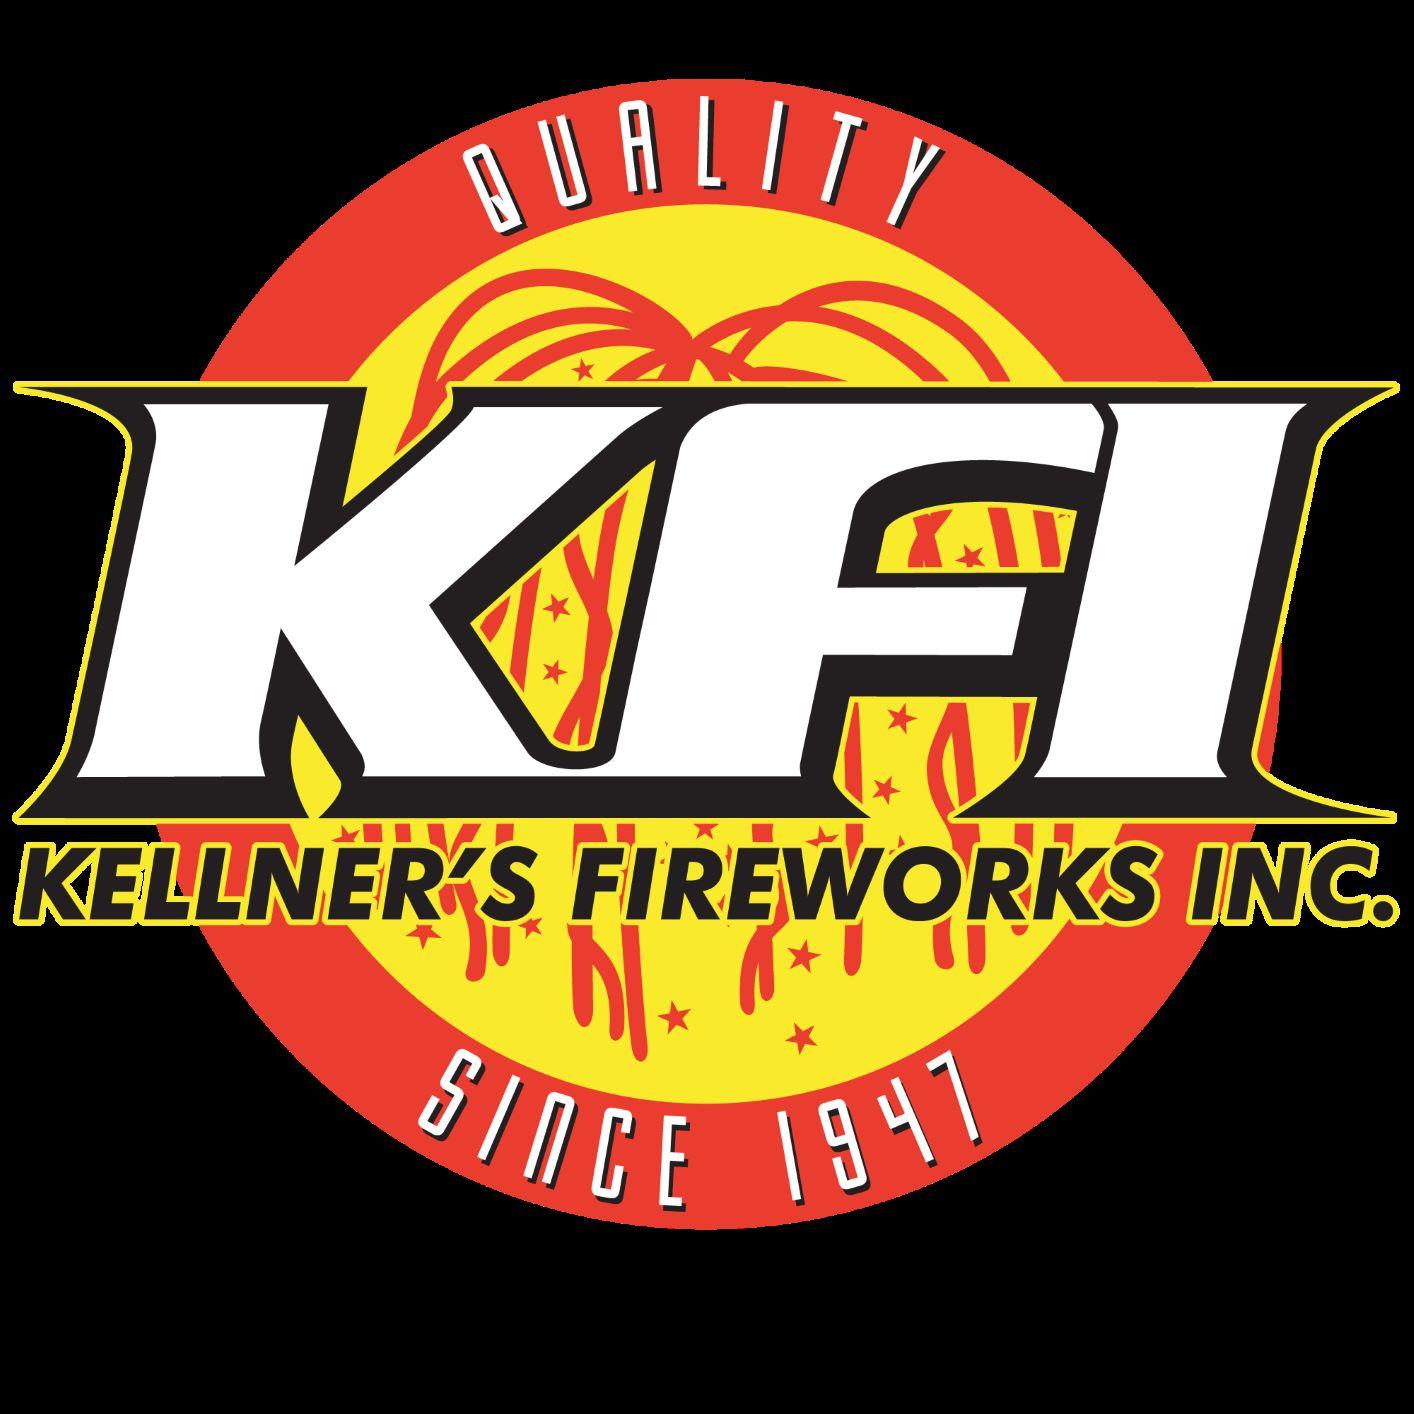 Kellner's Fireworks Inc.